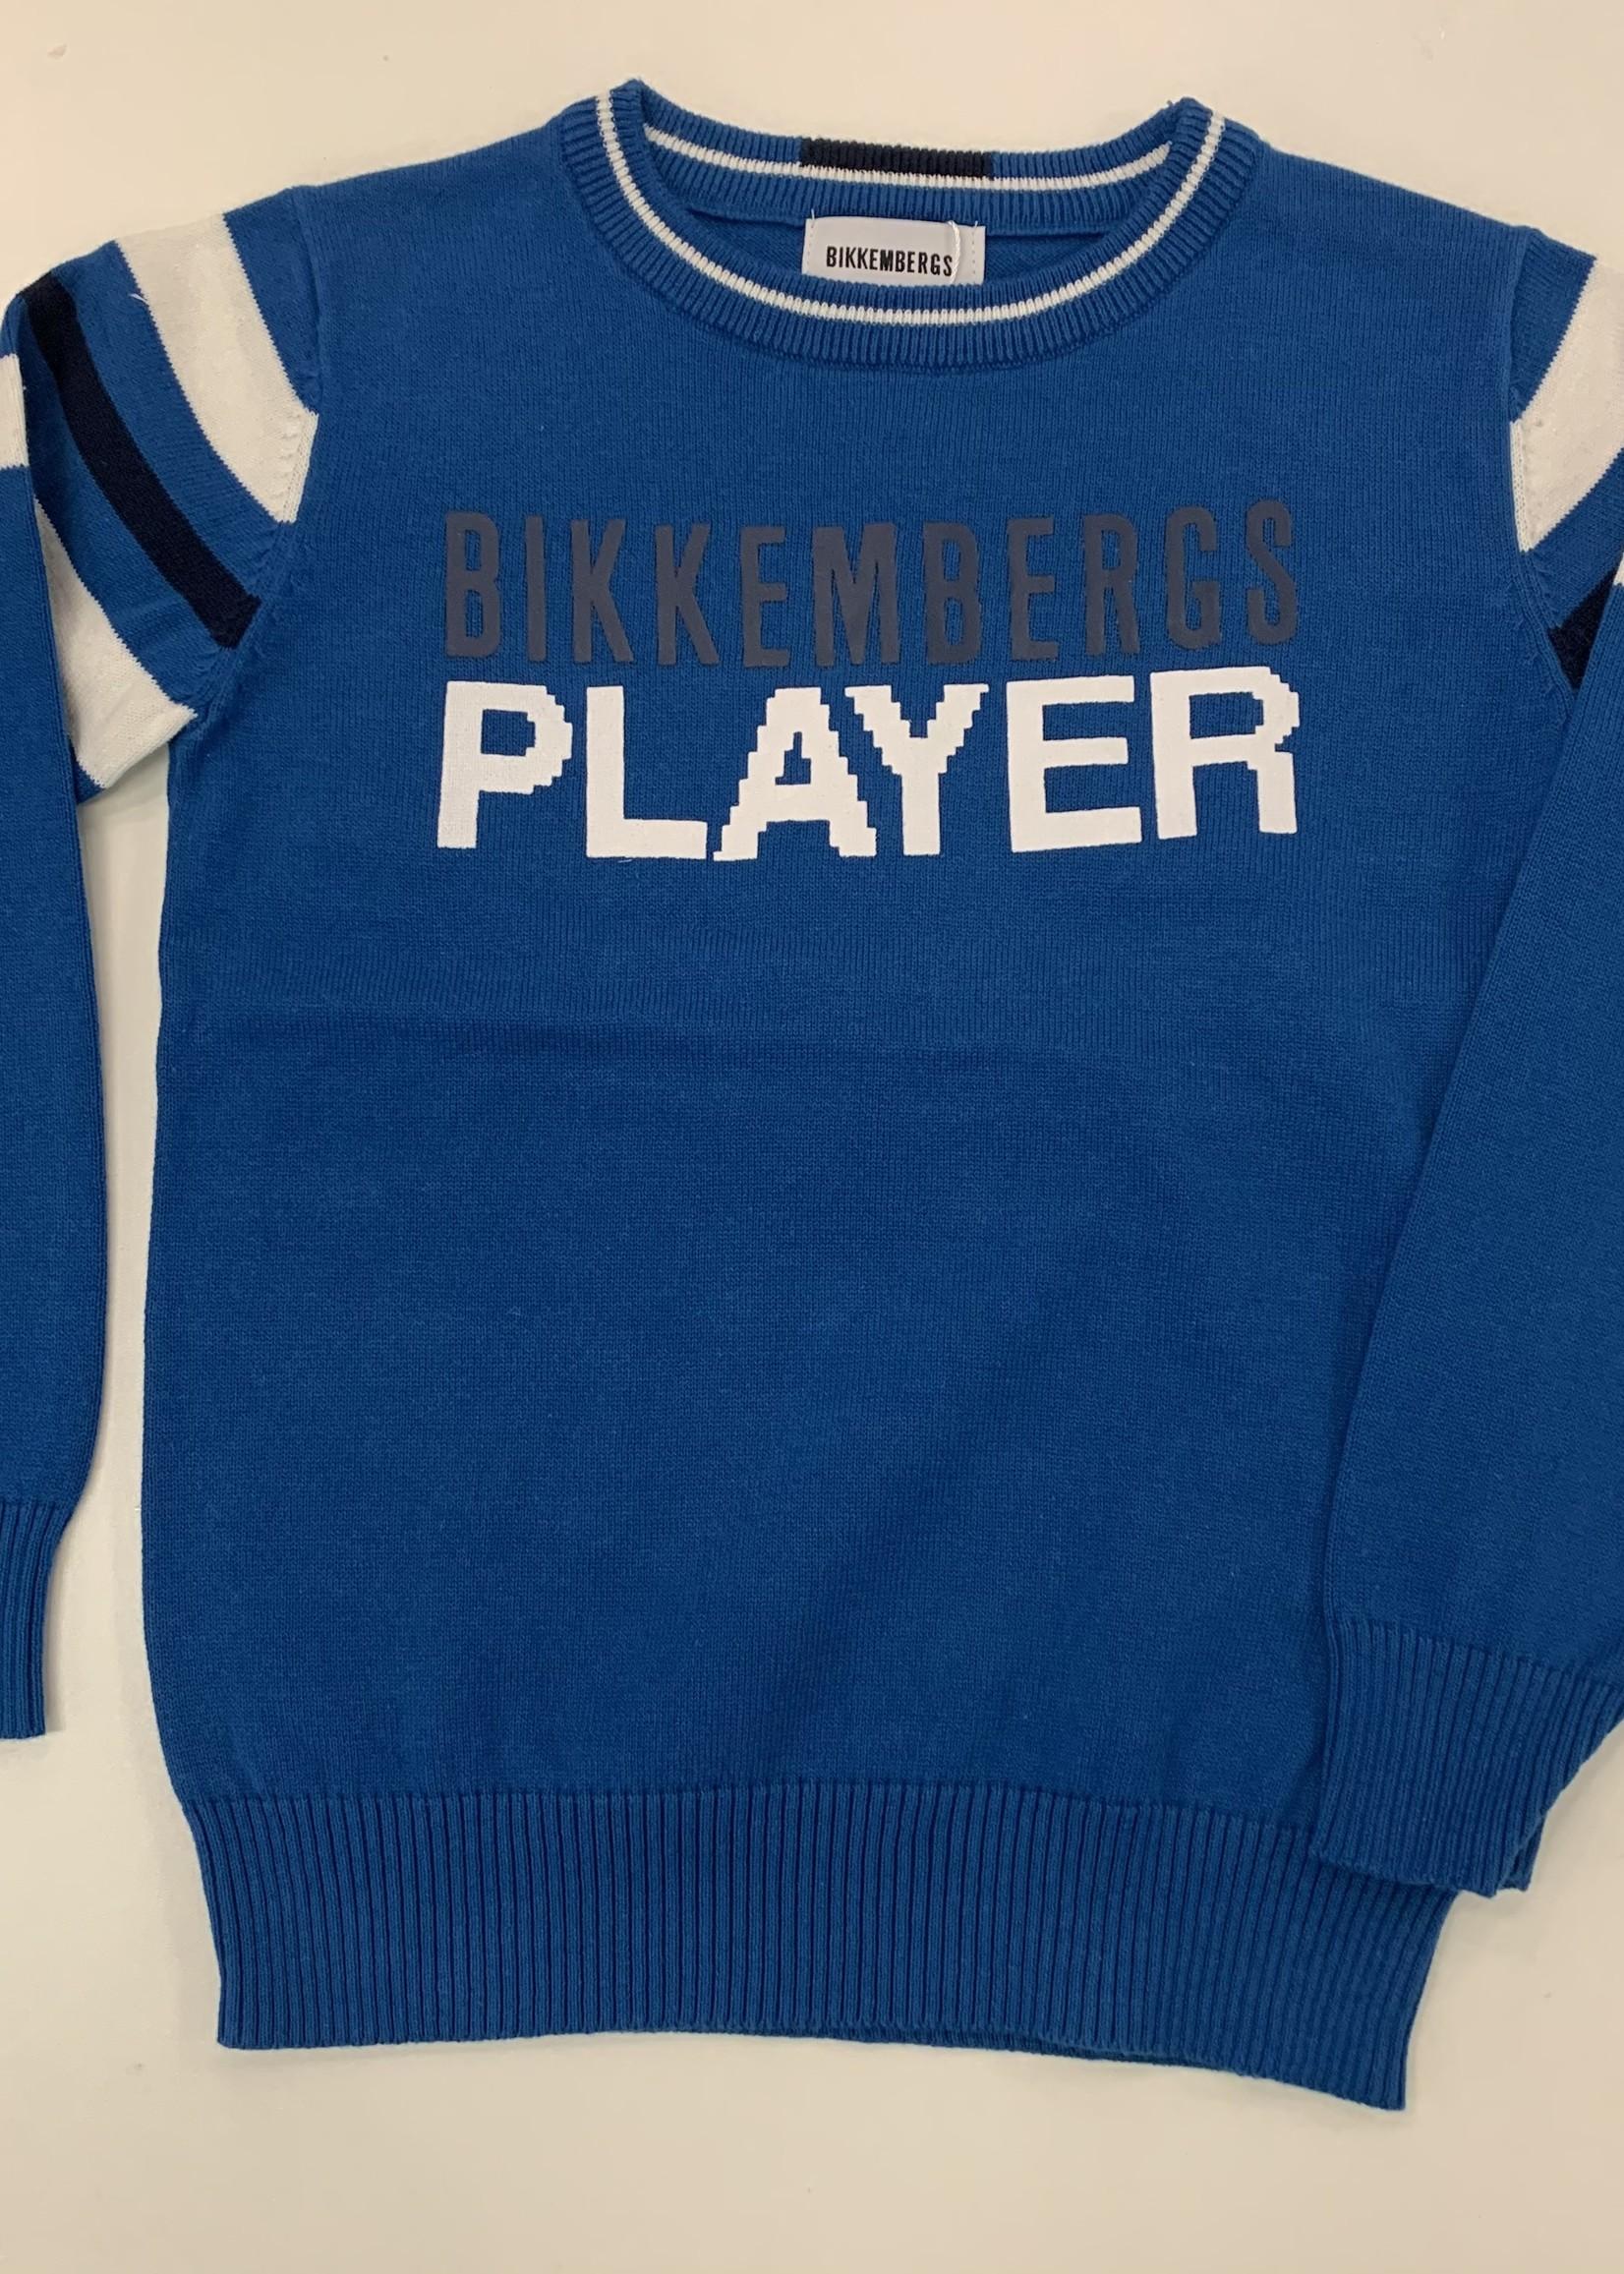 Bikkembergs Bikkembergs Sweater Princess Blue